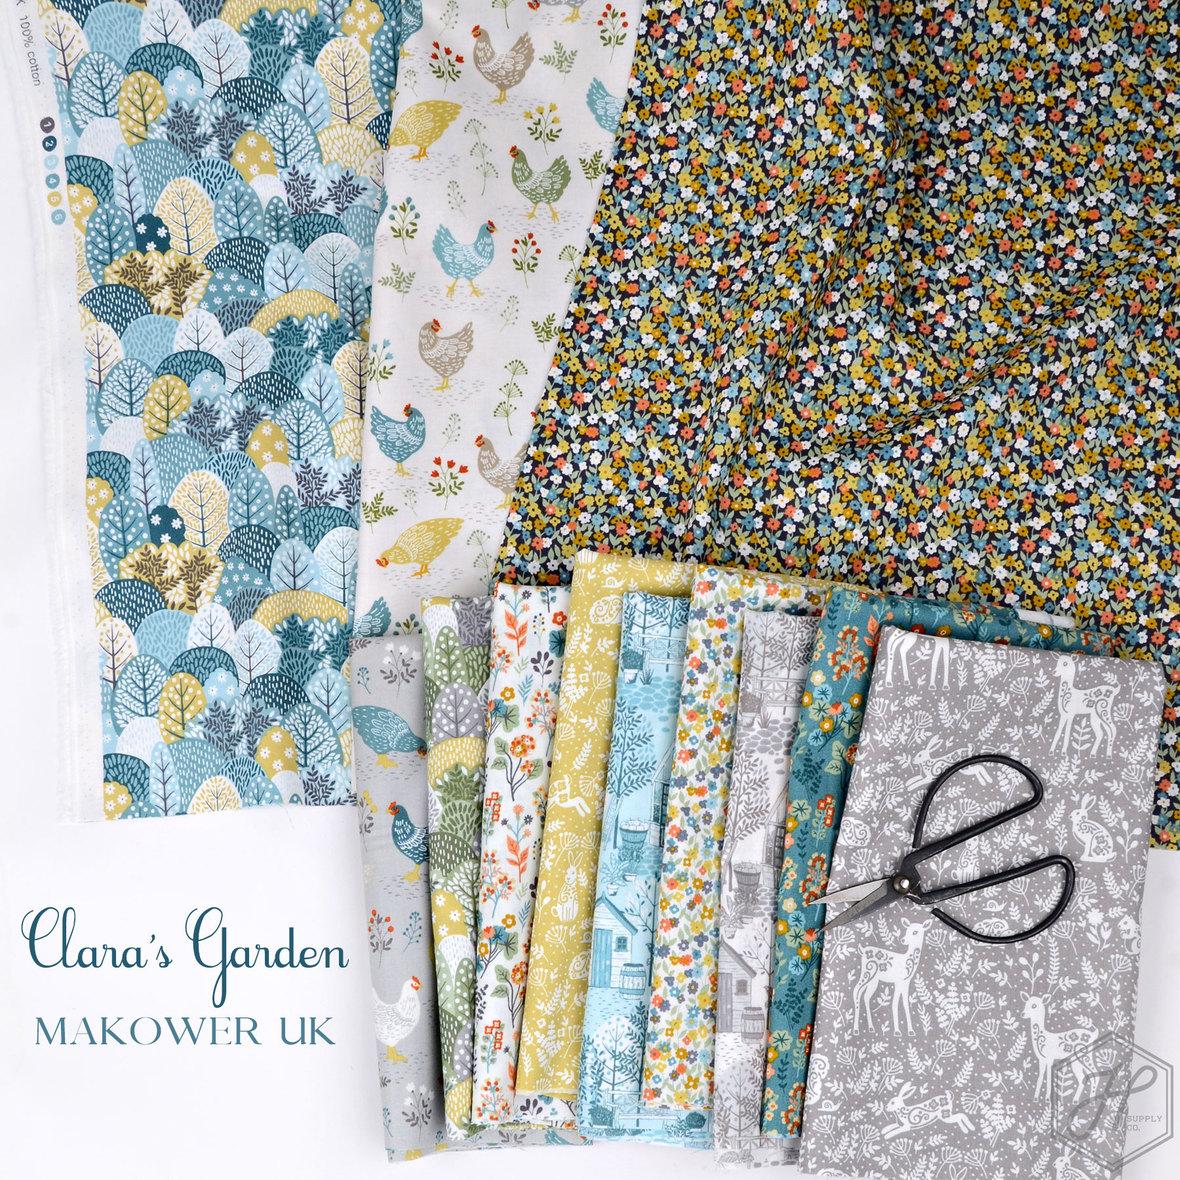 Clara-Garden-Makower-UK-at-Hawthorne-Supply-Co